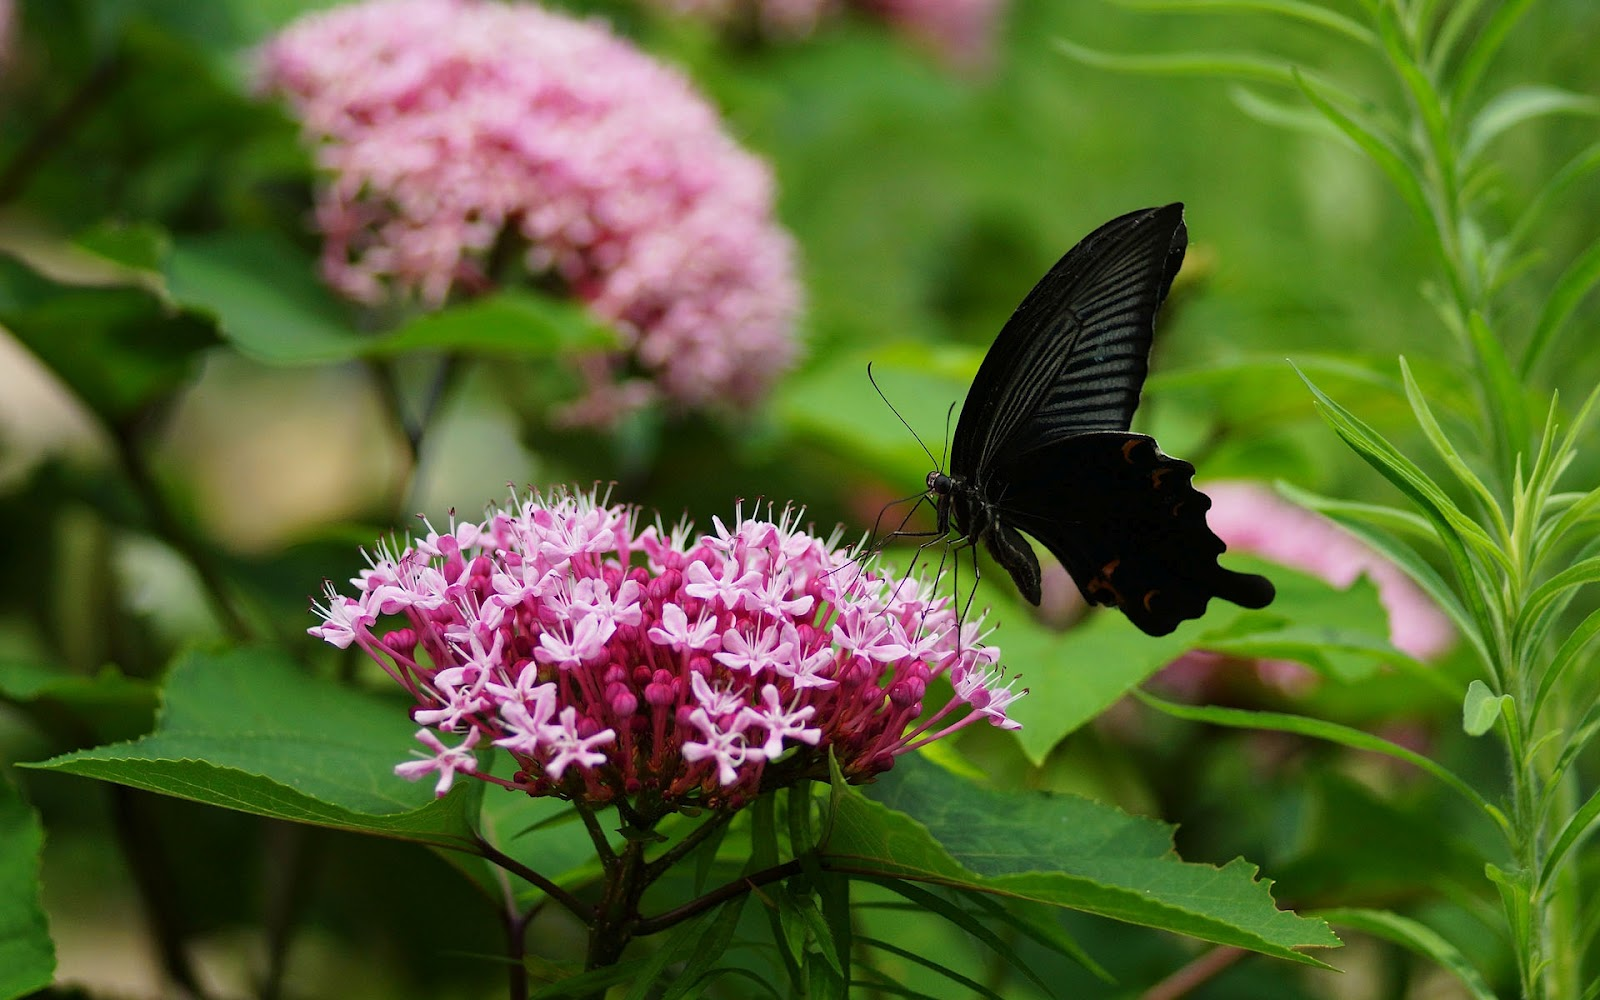 Hd wallpaper butterfly - Hd Bloemen Wallpapers Bureaublad Achtergronden